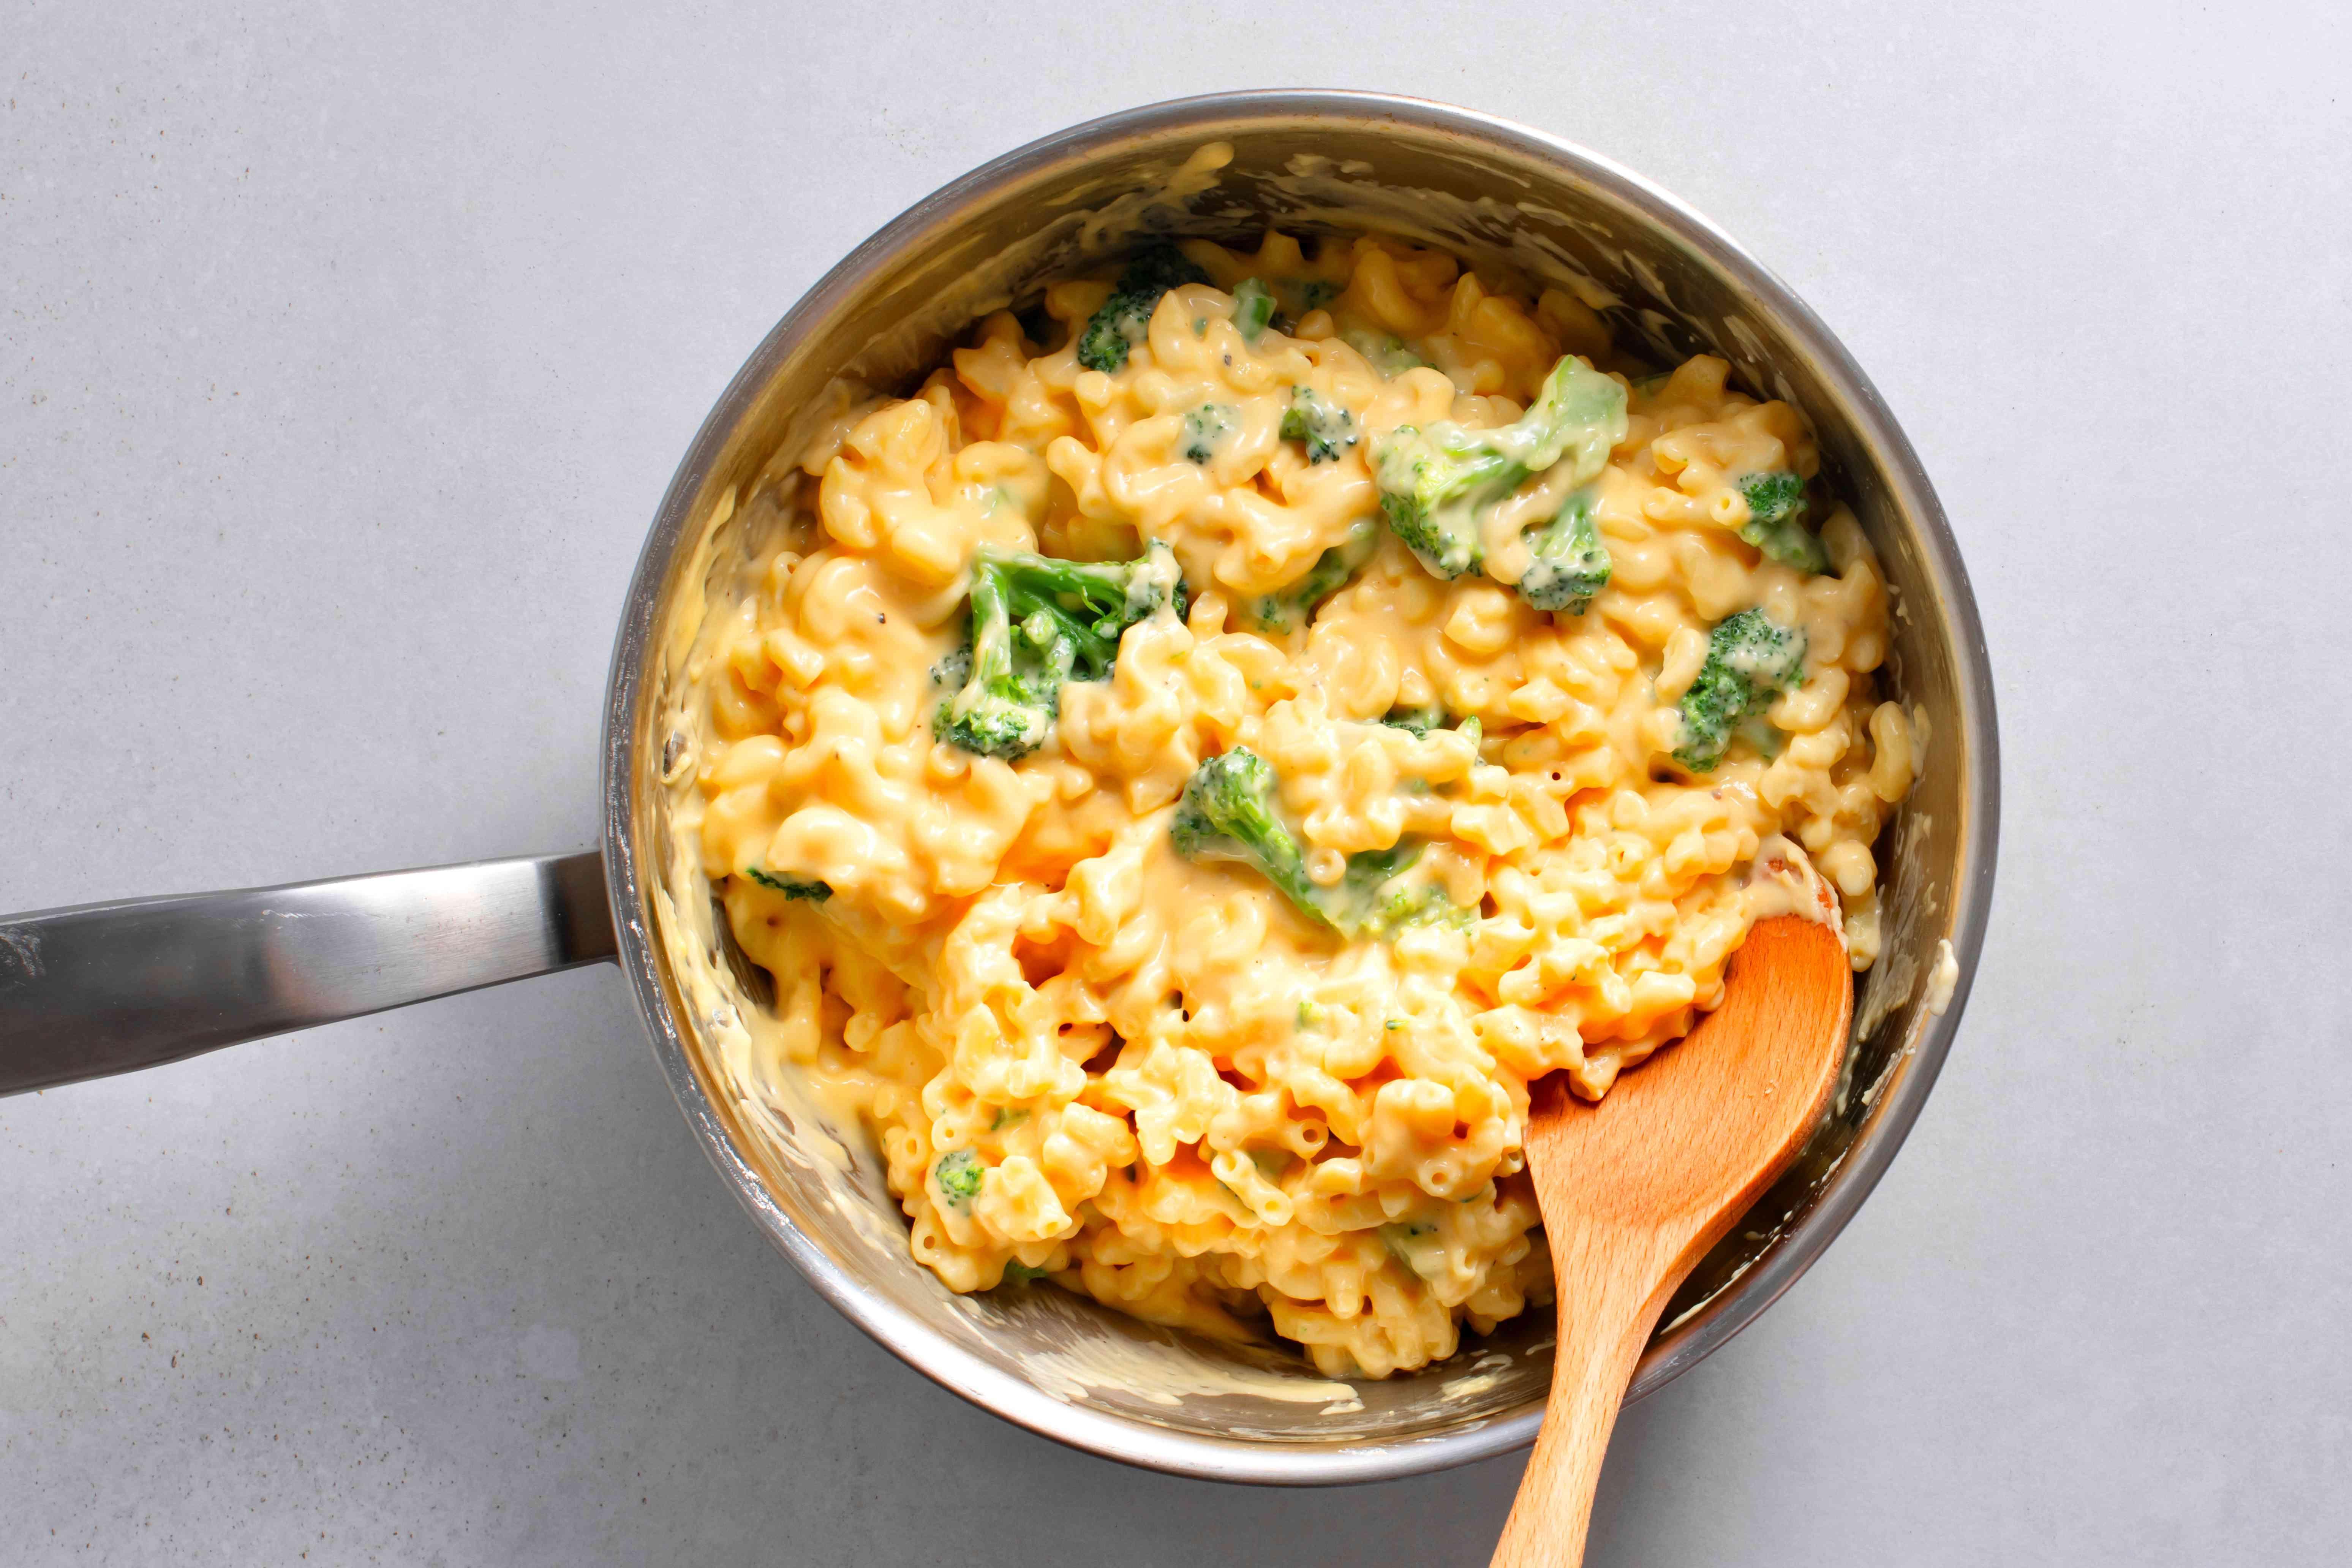 Easy One-Pan Broccoli Macaroni and Cheese in a saucepan